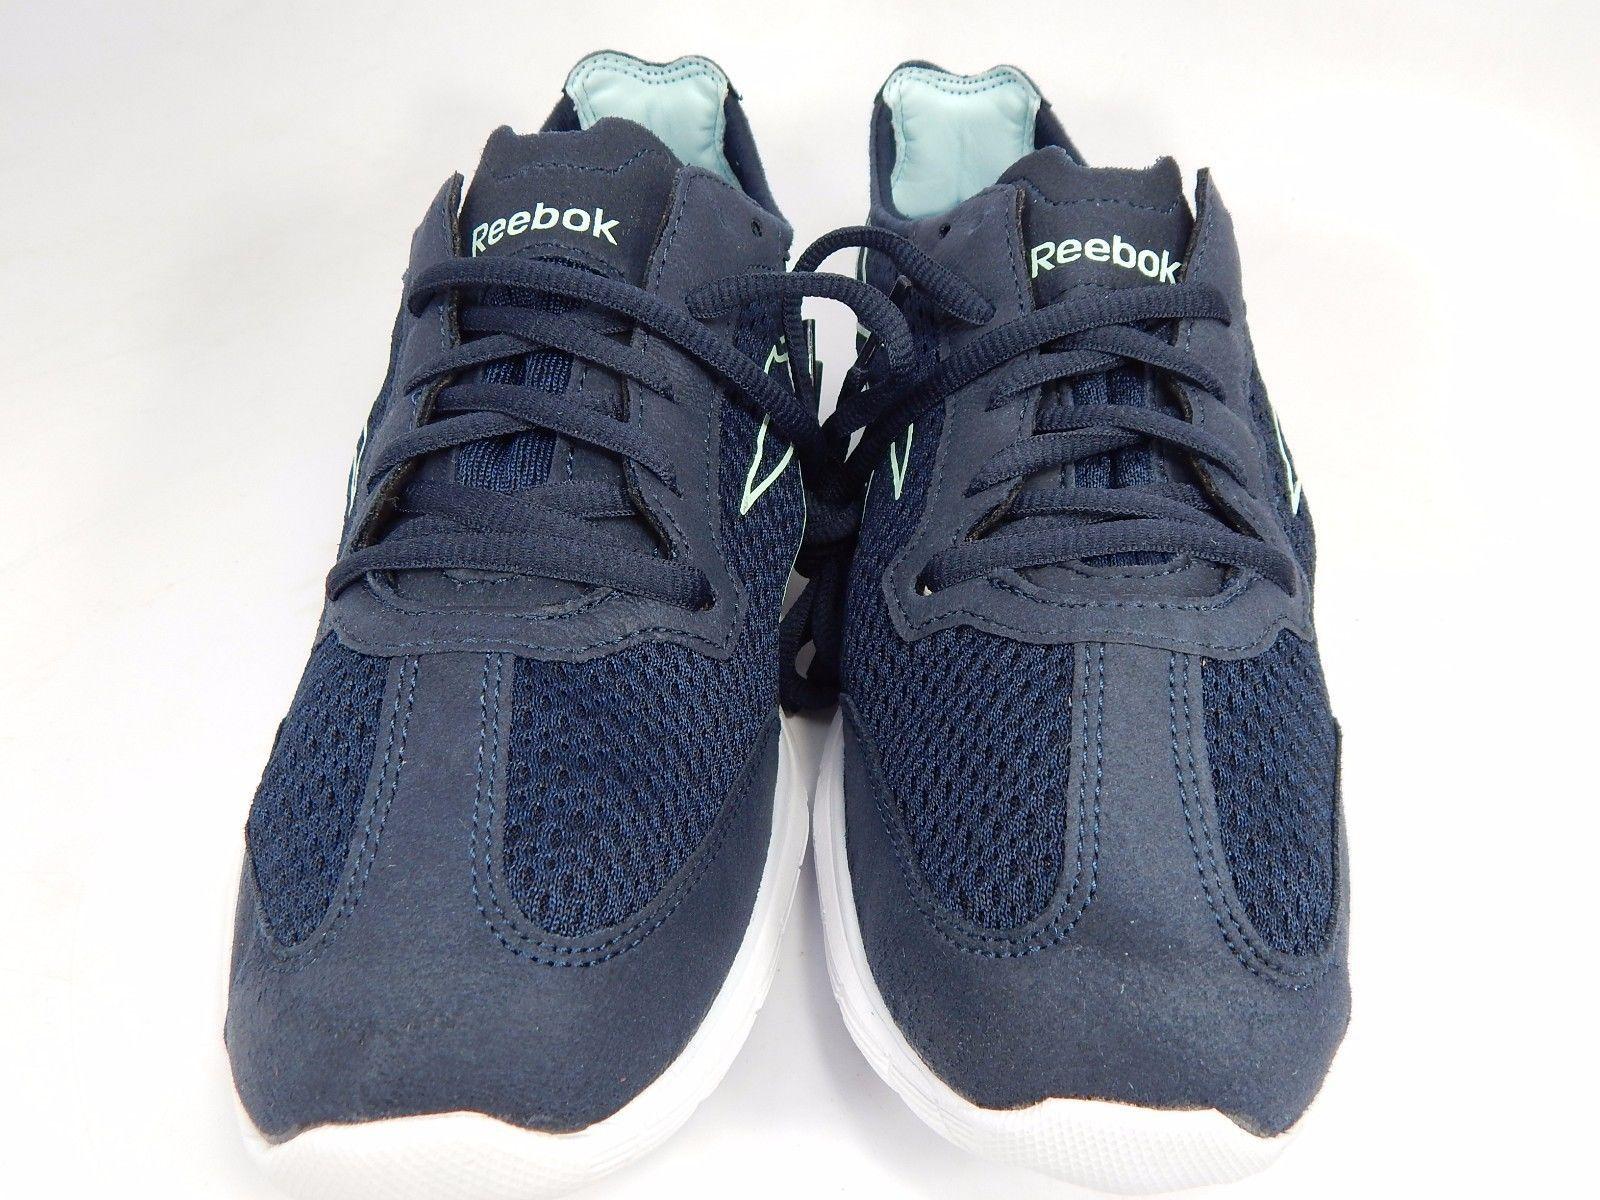 Reebok Sport Ahead Action RS Women's Running Shoes Size US 7.5 M (B) EU 38 Blue